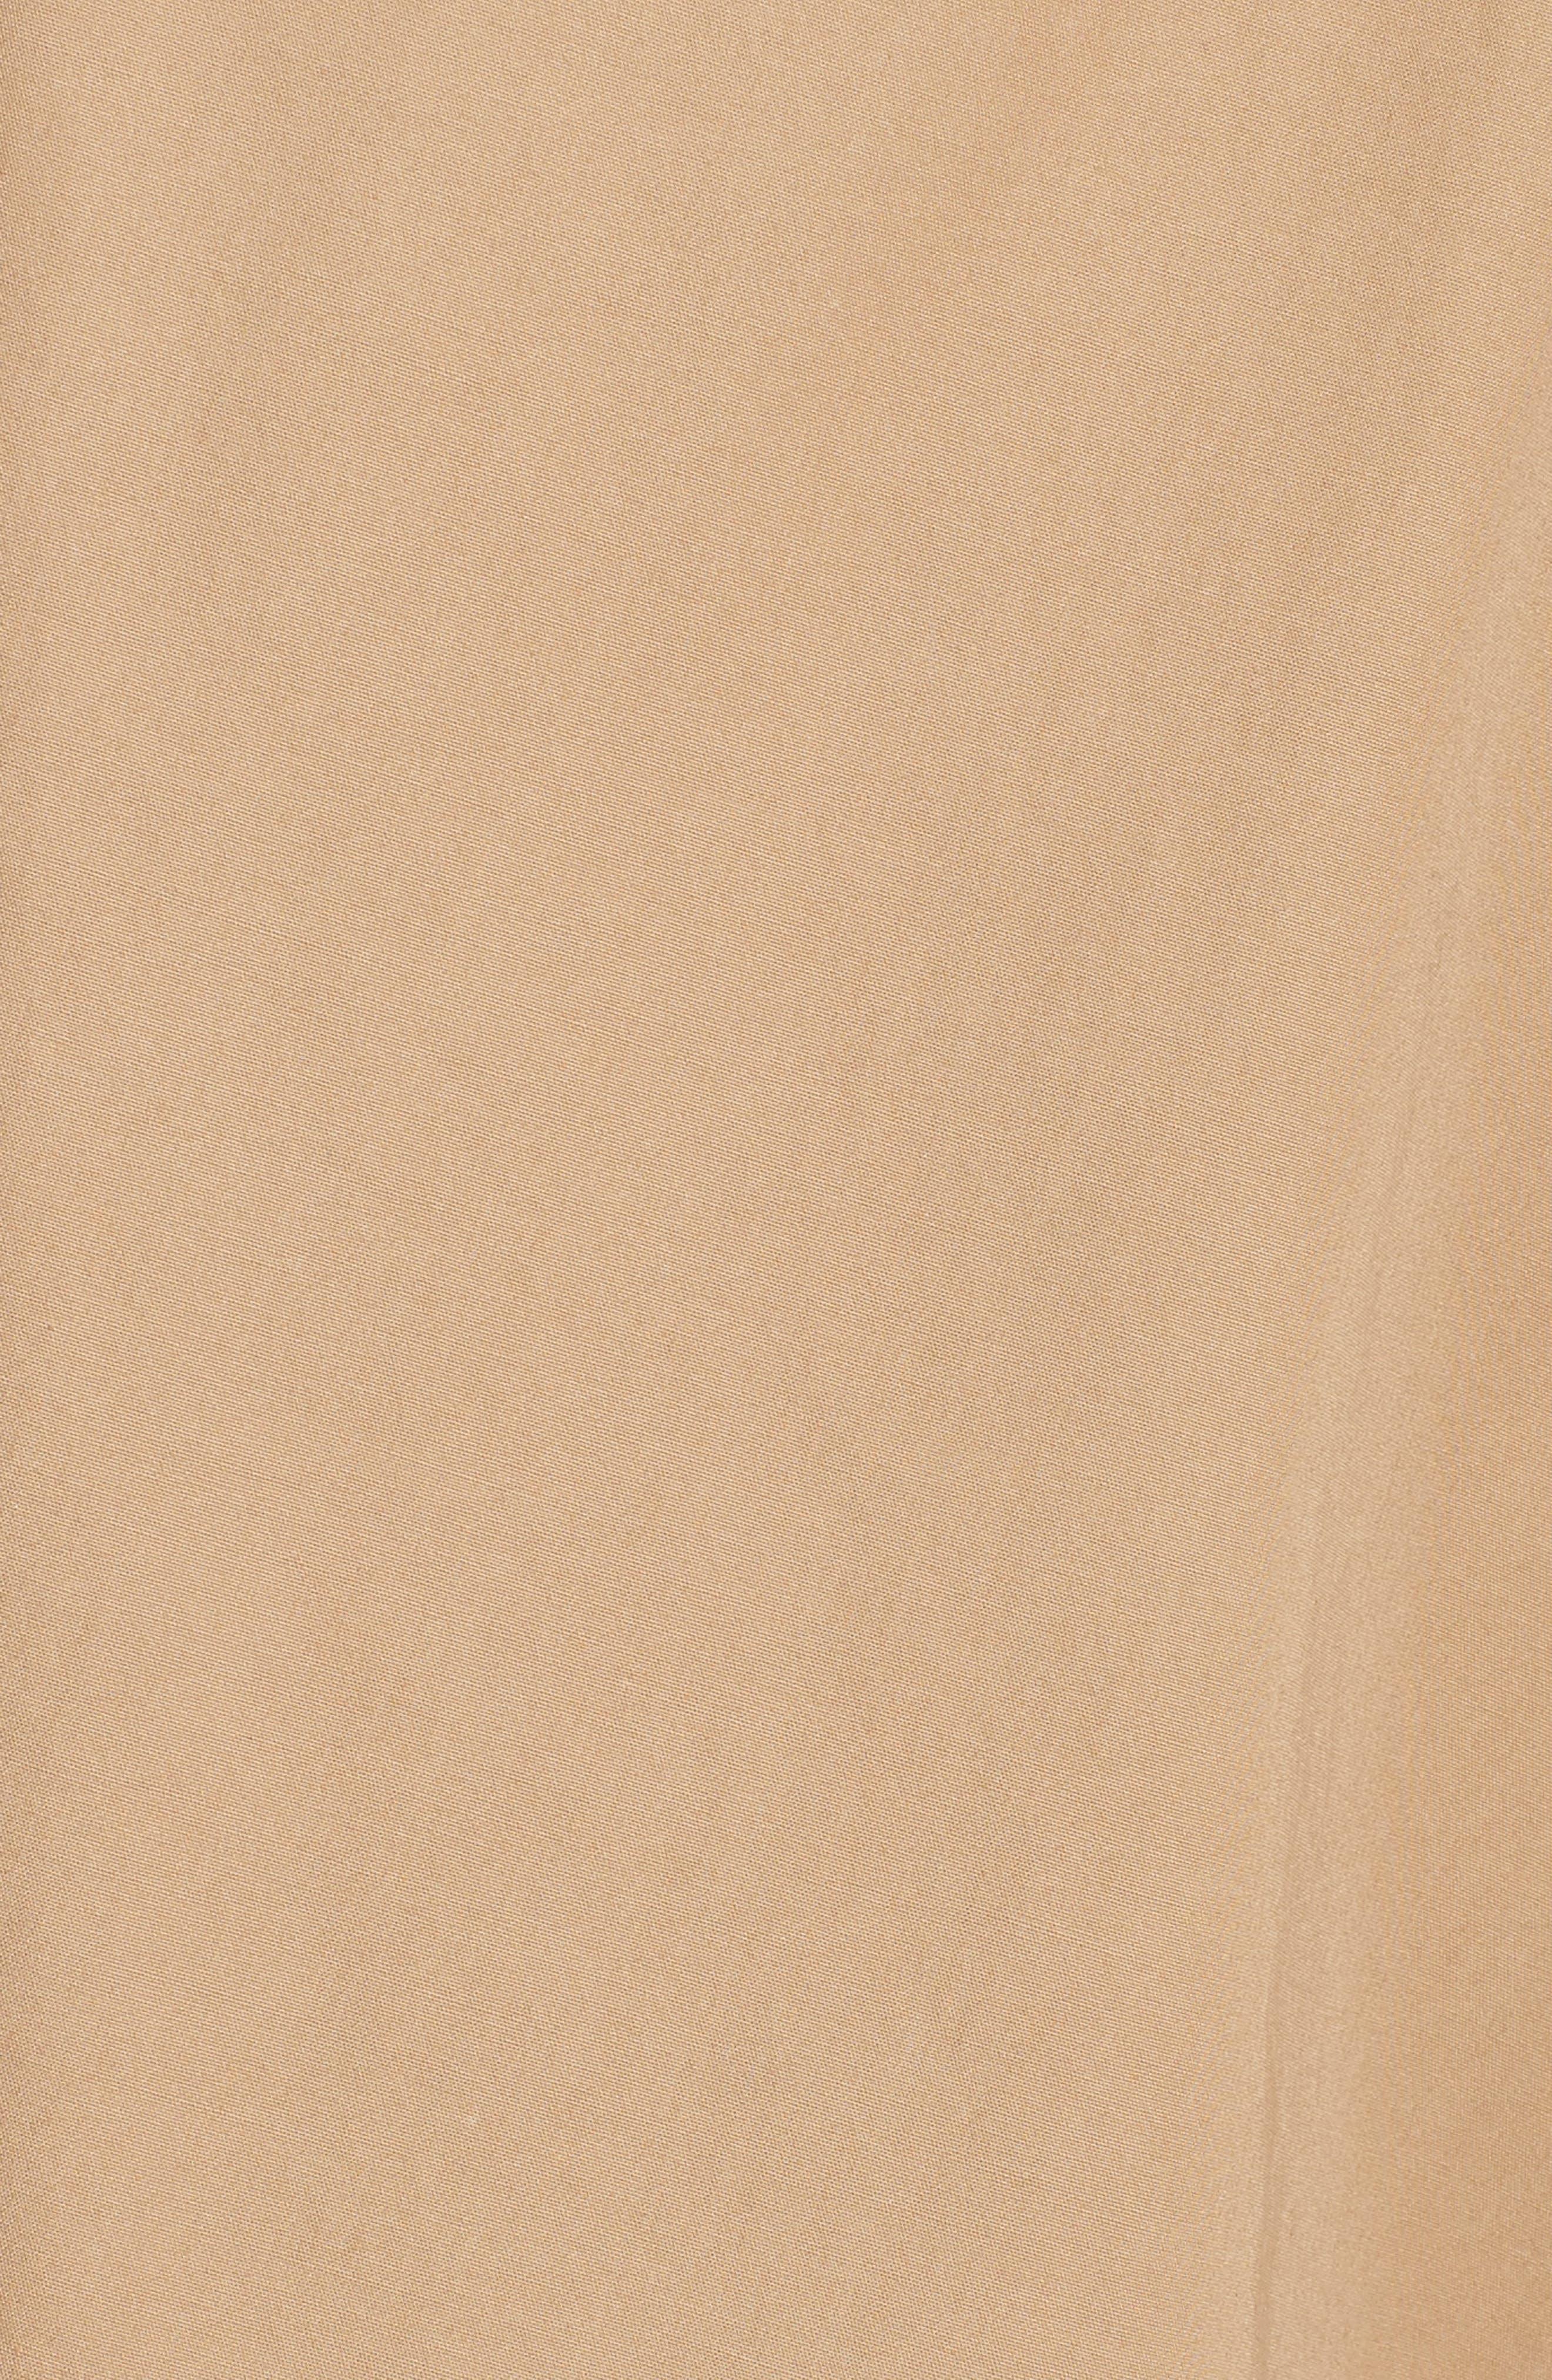 Pleated Wrap Dress,                             Alternate thumbnail 5, color,                             Camel